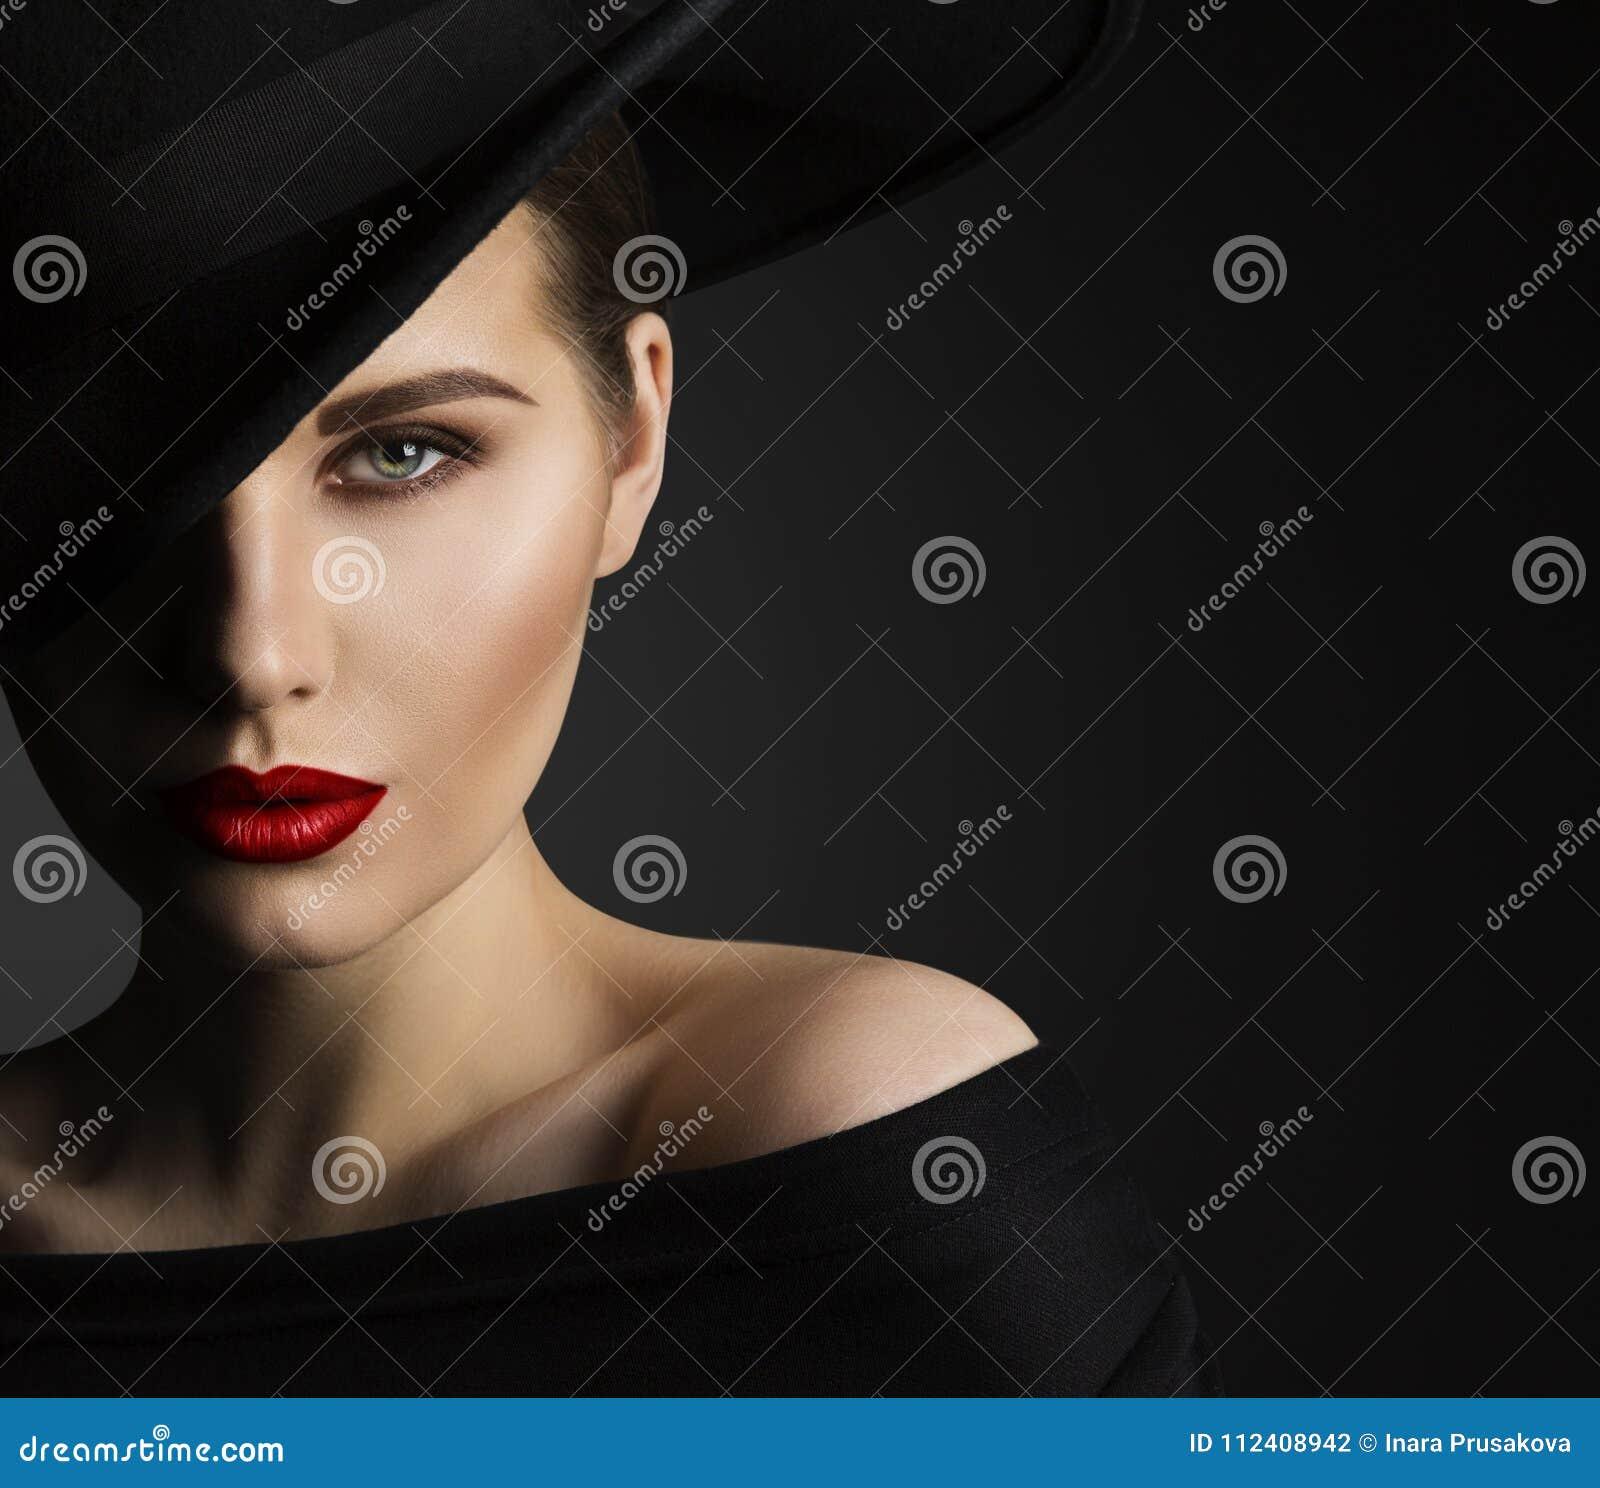 Modelo de forma Beauty Portrait, beleza da mulher, chapéu negro elegante